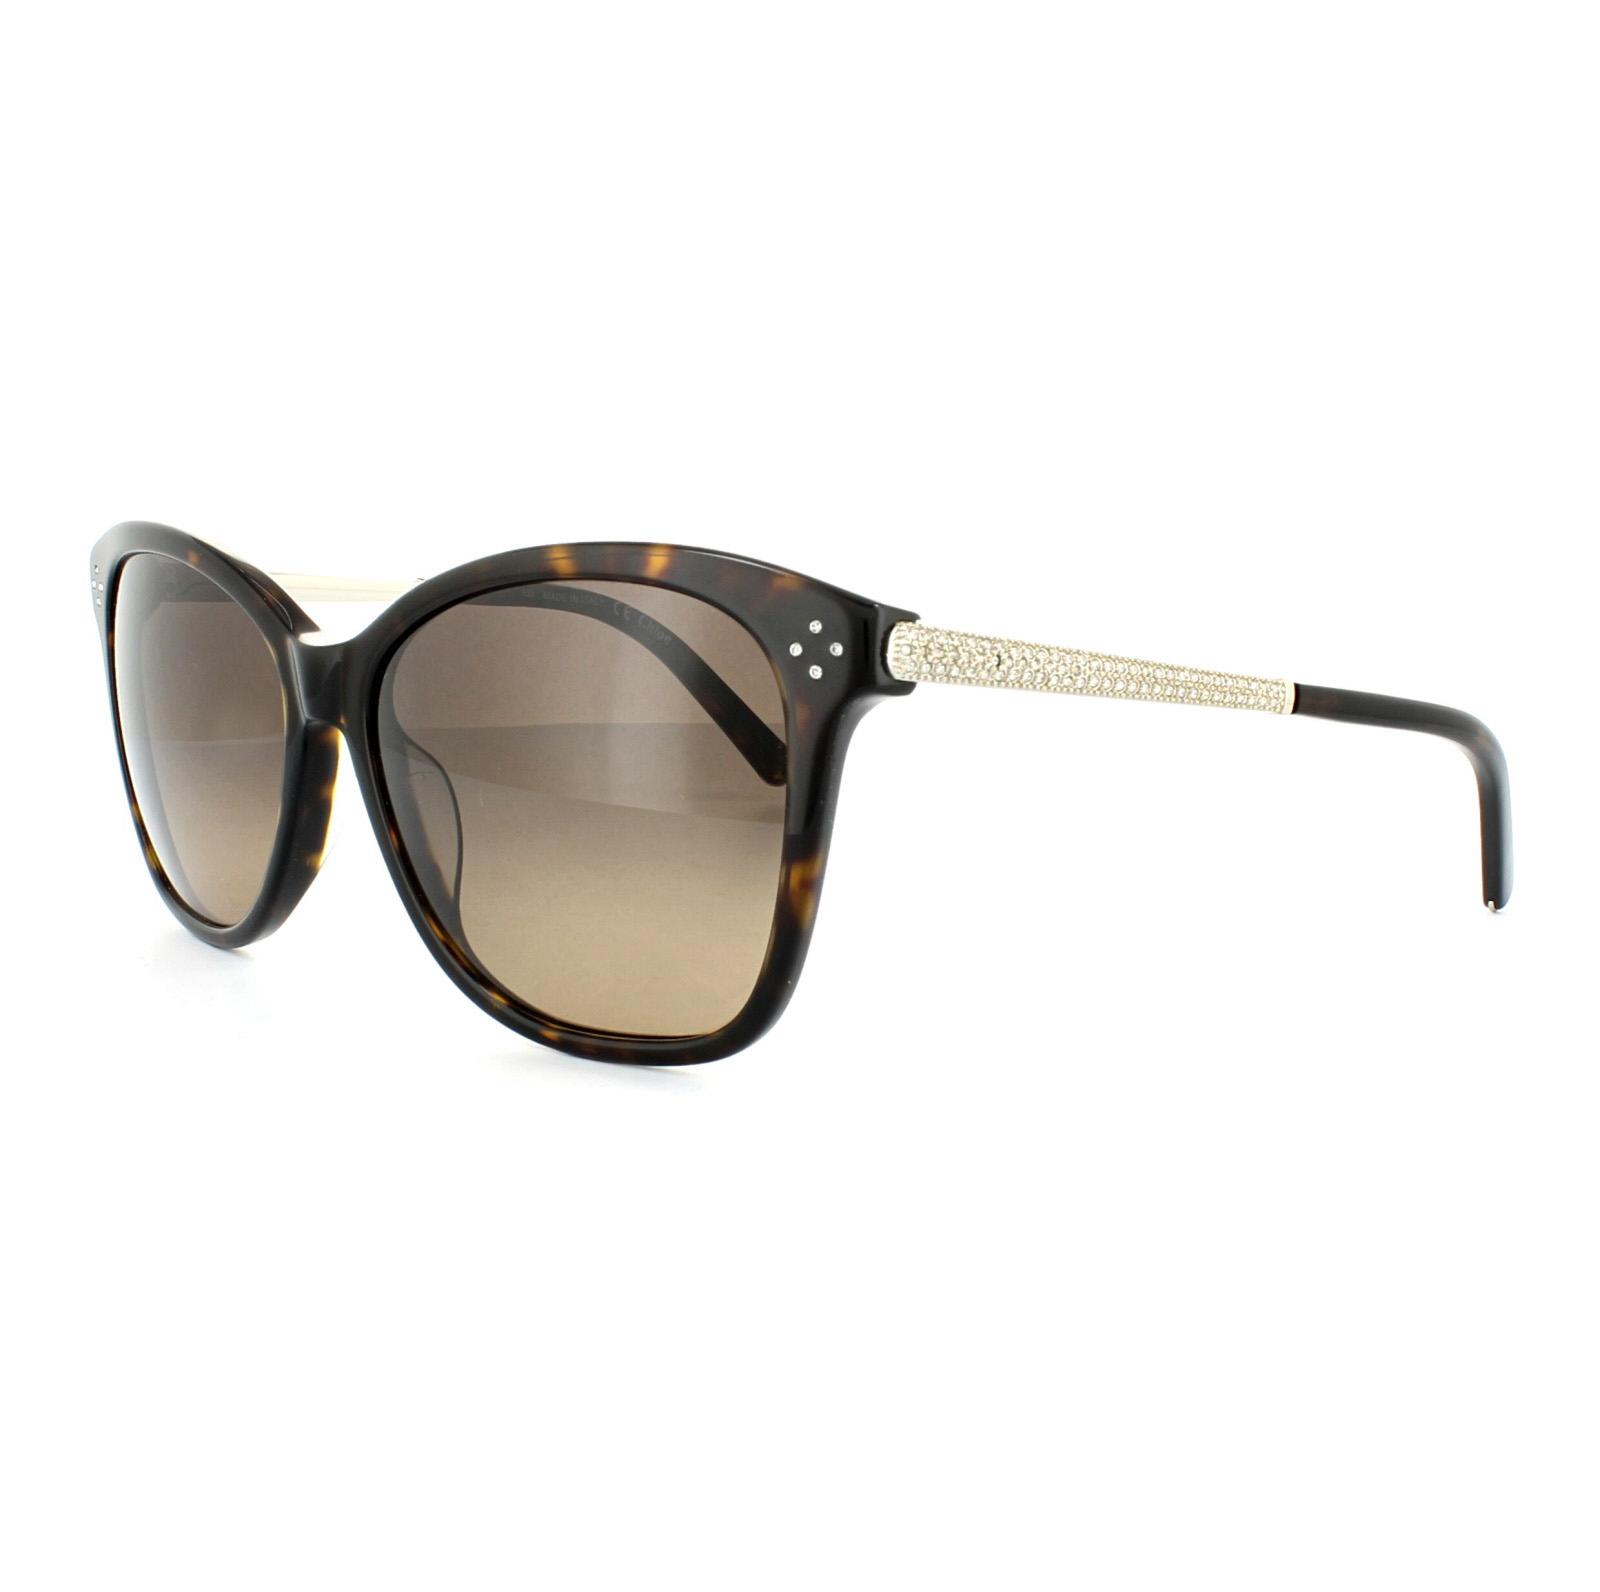 d32a158c0a0 Cheap Chloe CE657SR Sunglasses - Discounted Sunglasses